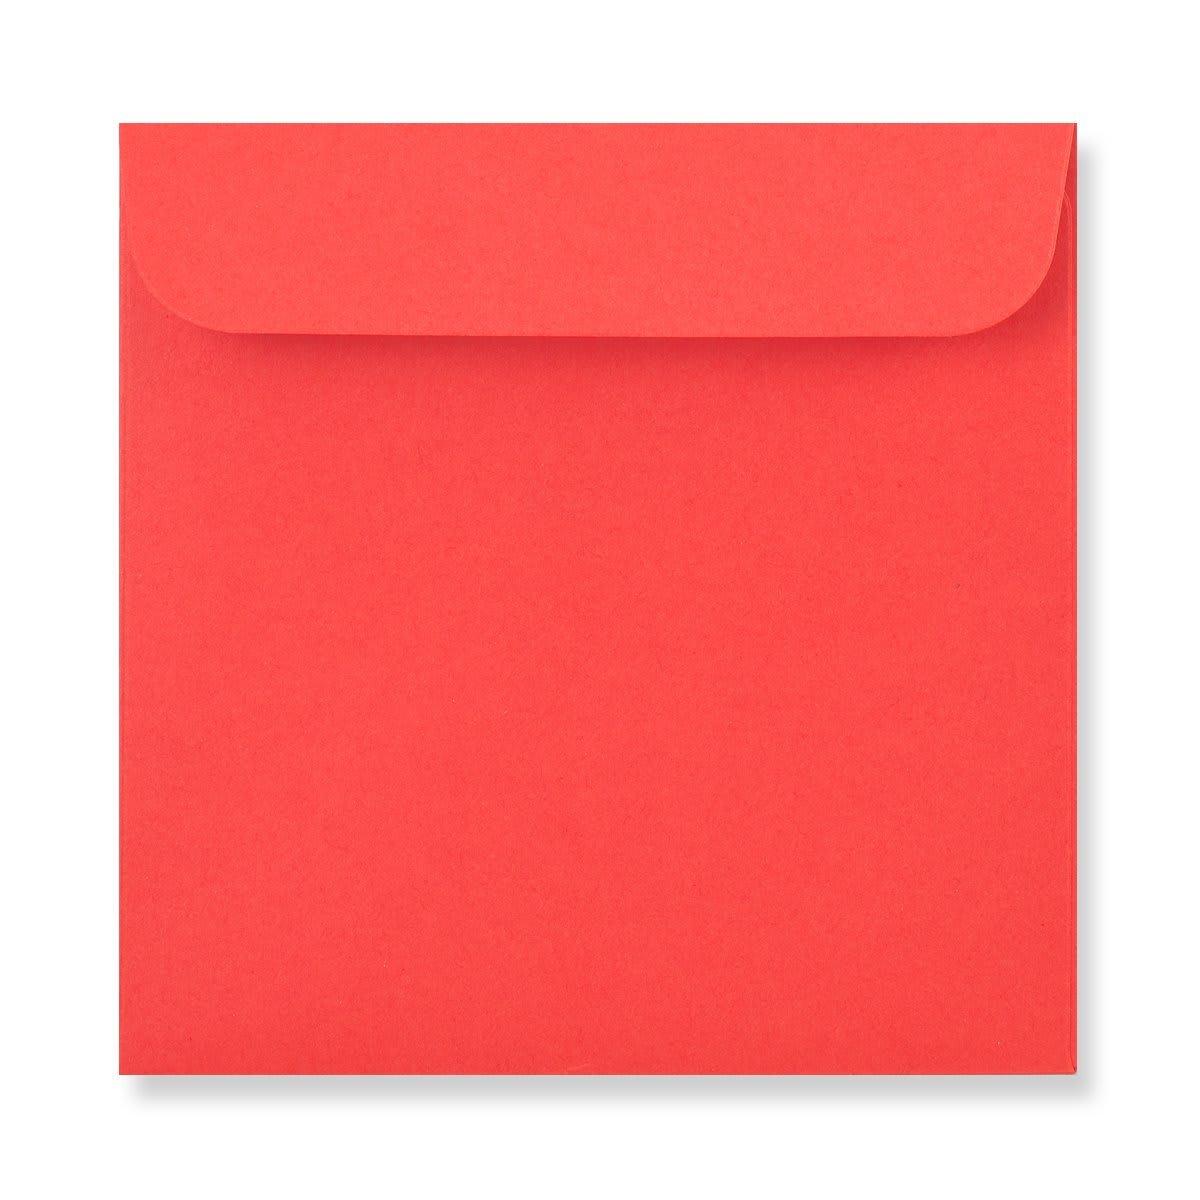 85 x 85mm RED MINI CD WINDOW ENVELOPES